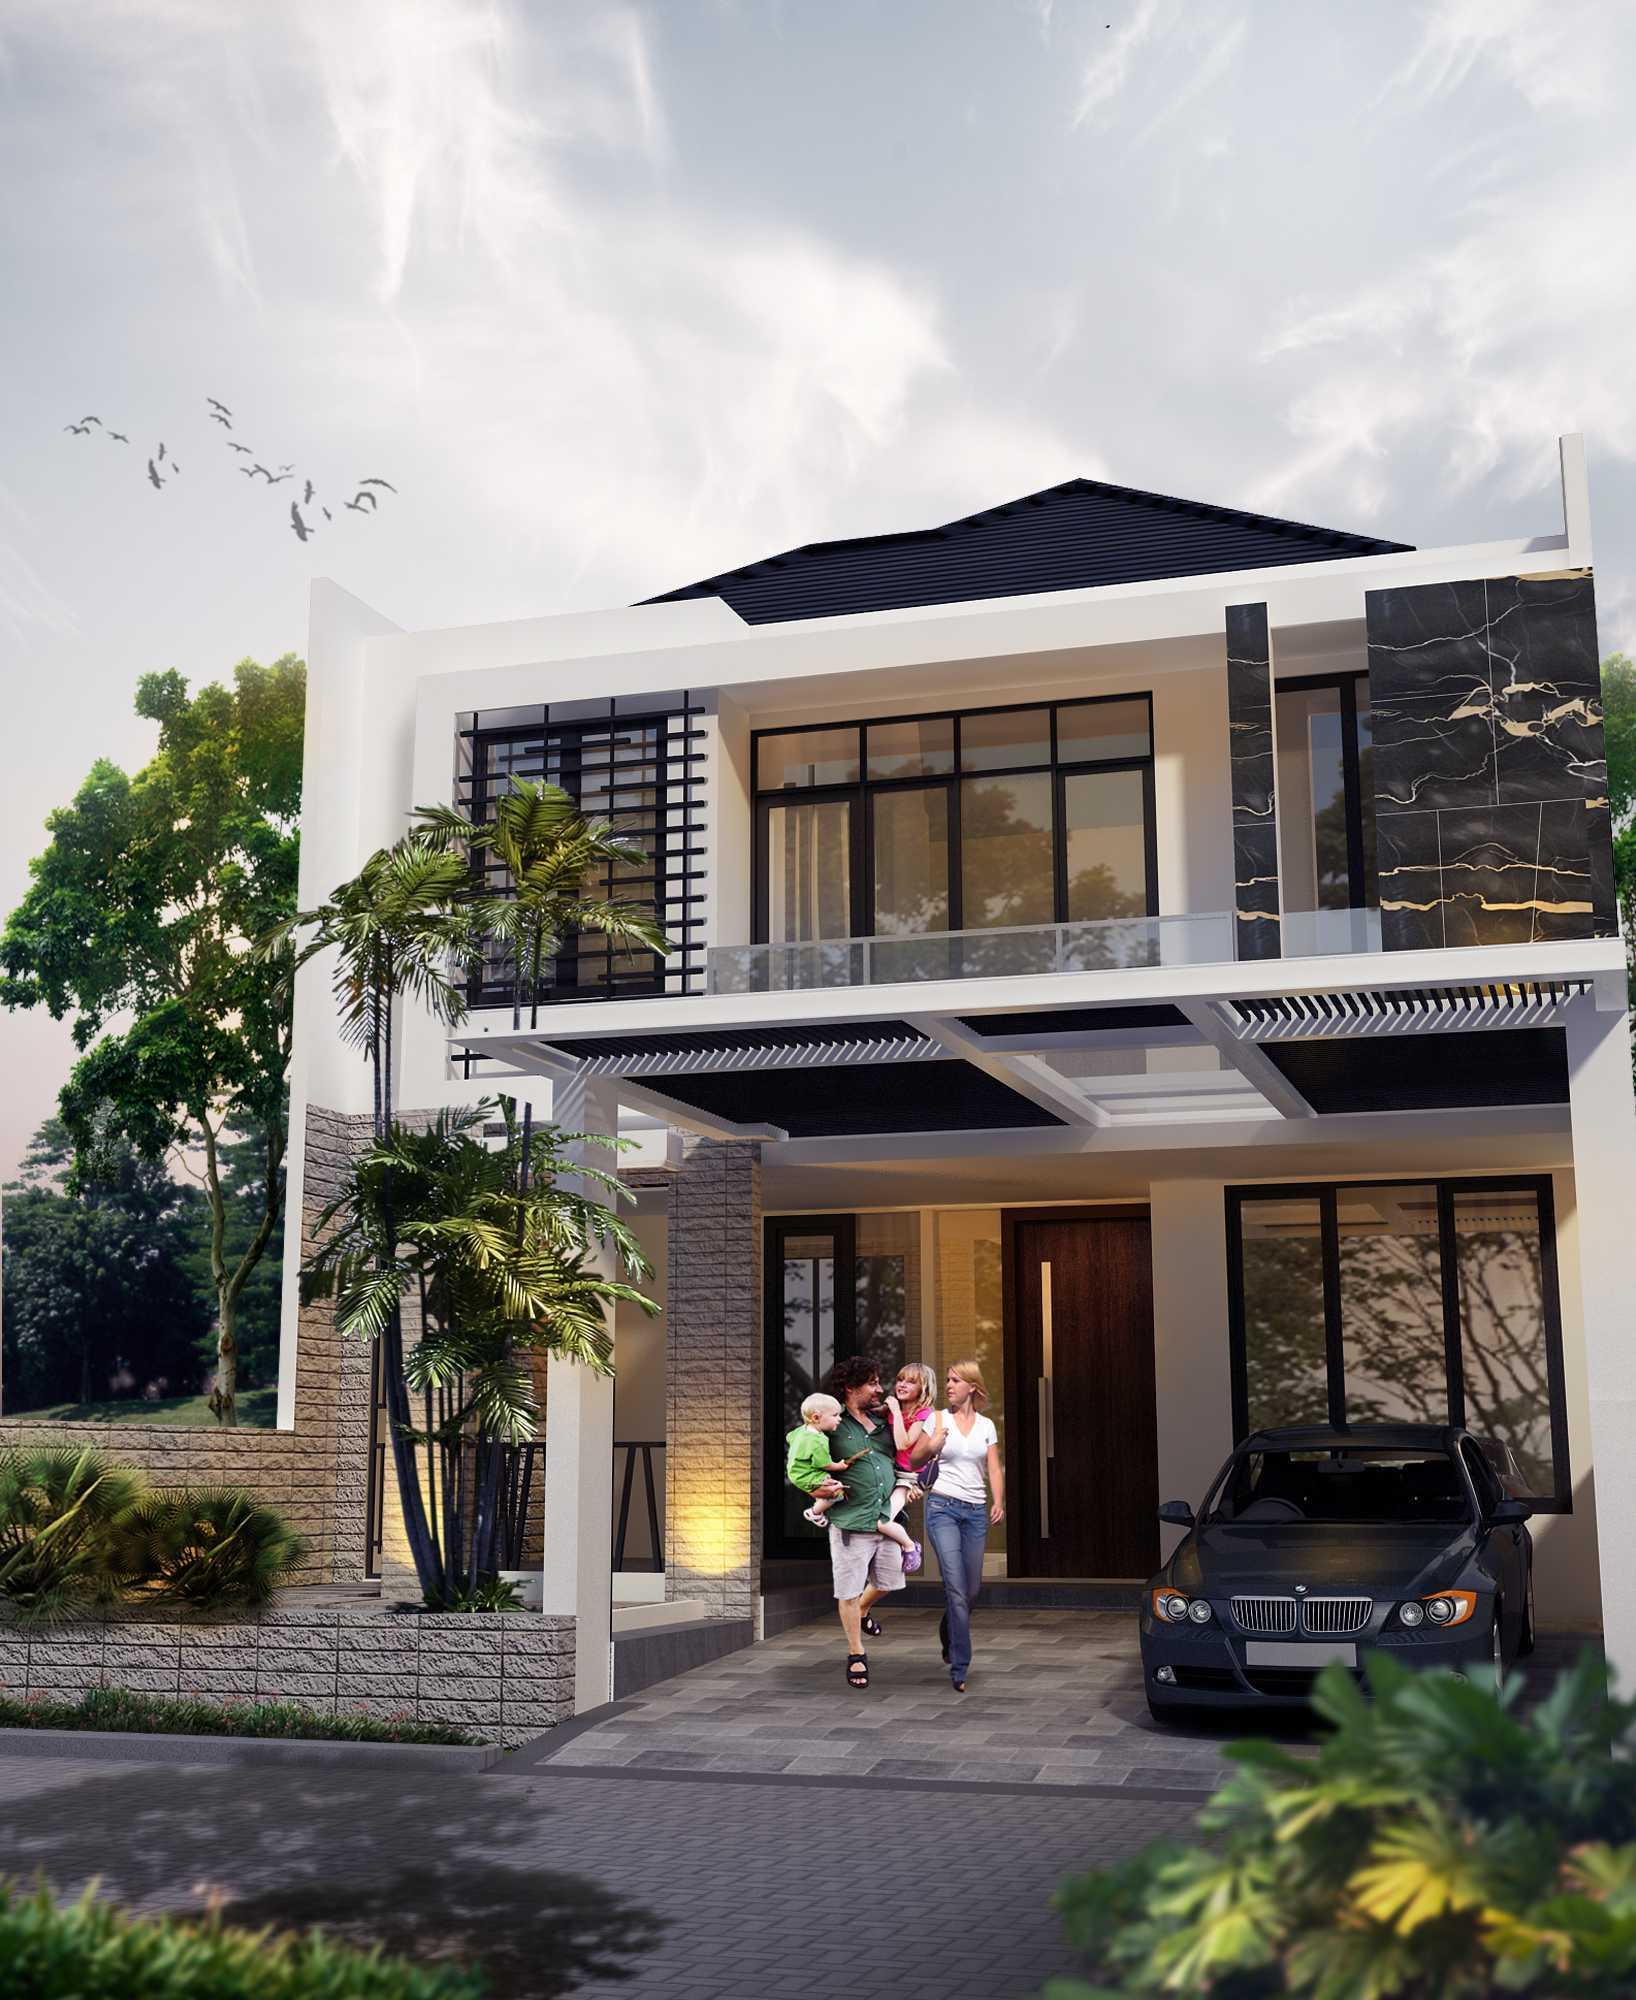 Winner Architecture T Tropical House Jemur Wonosari, Wonocolo, Kota Sby, Jawa Timur 60235, Indonesia Jemur Wonosari, Wonocolo, Kota Sby, Jawa Timur 60235, Indonesia T Tropical House - Exterior   40964